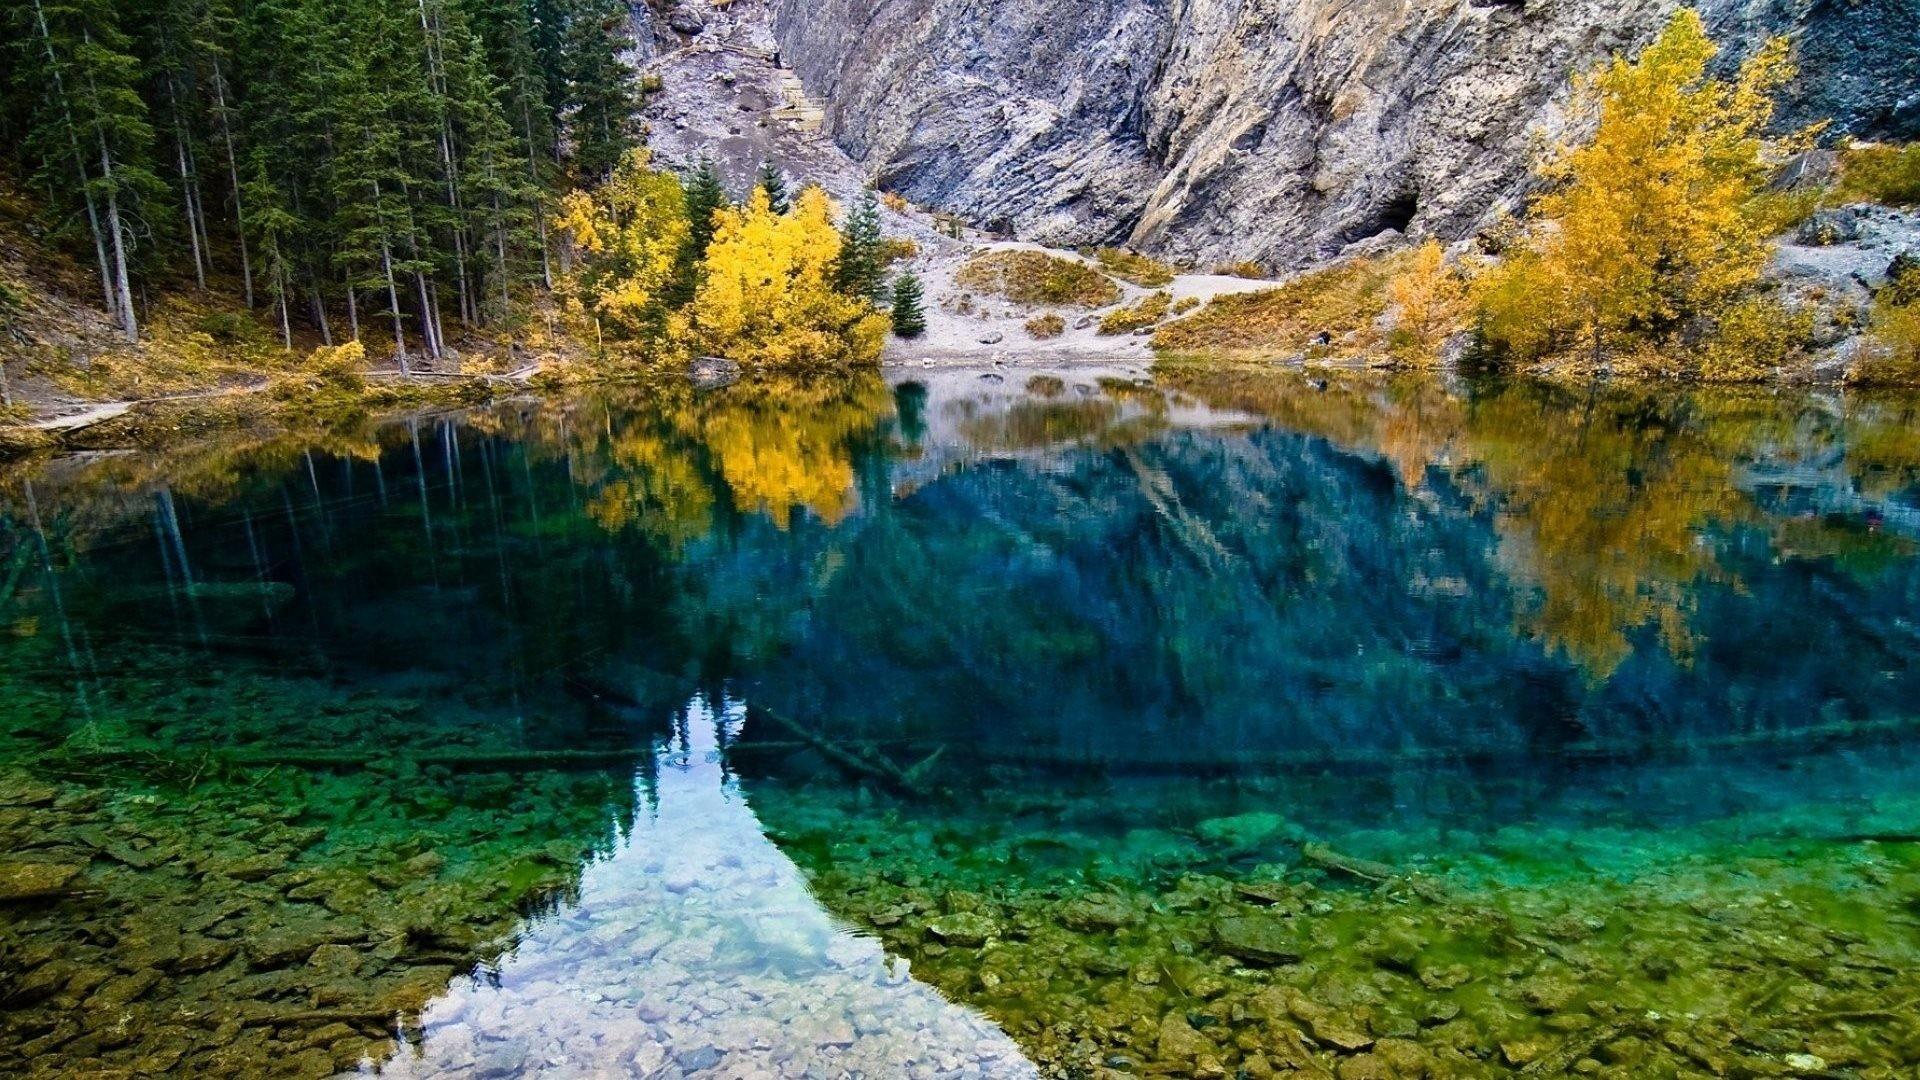 Galaxy S5 Fall Wallpaper Hd Fall Mountain Wallpaper 41 Images